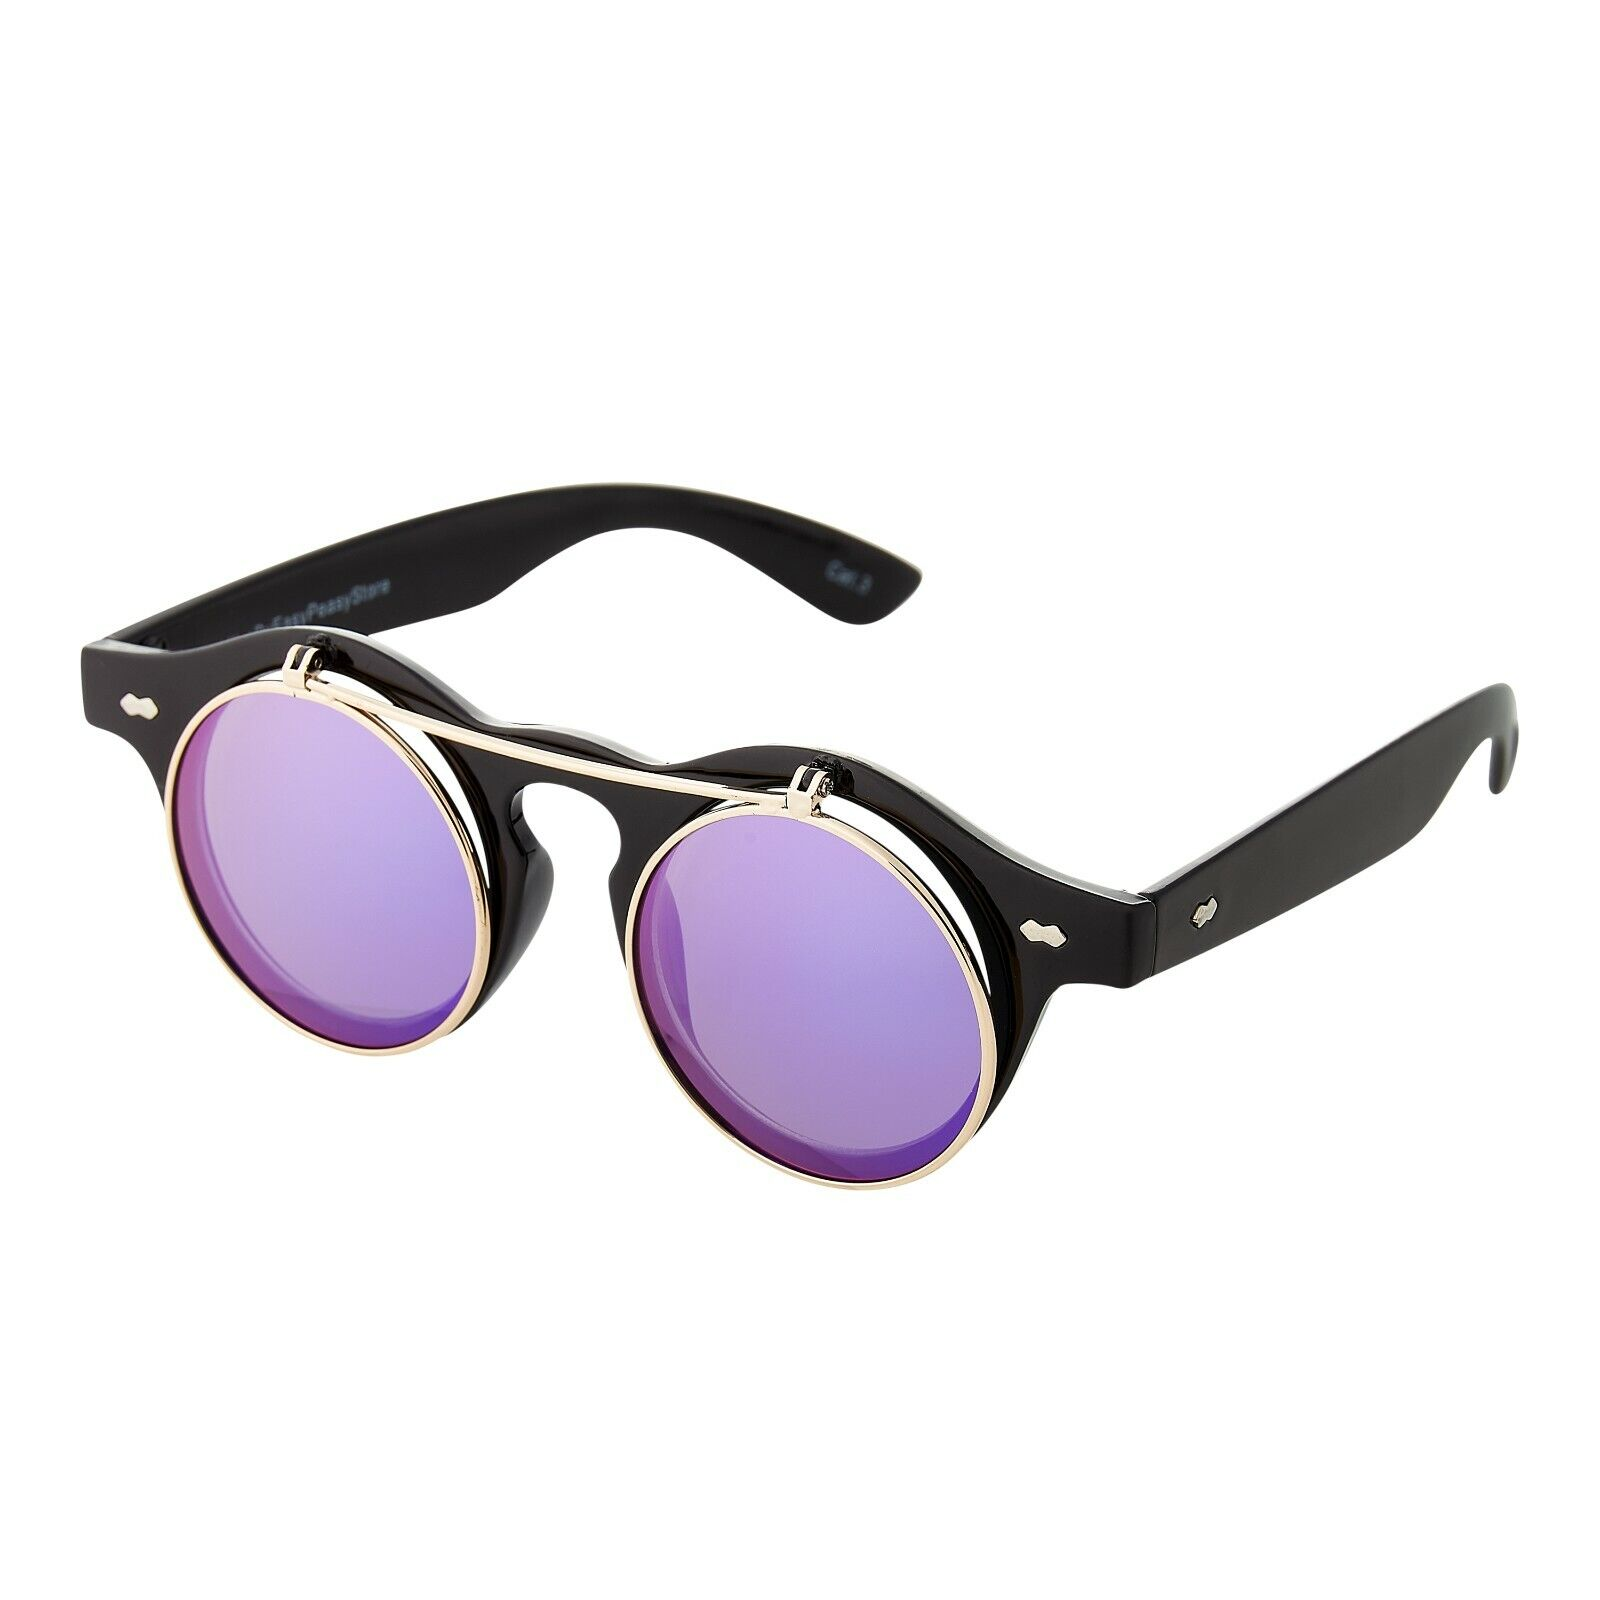 Black + Purple Mirrored Flip up Circle Steampunk Glasses Cyber Round Sunglasses